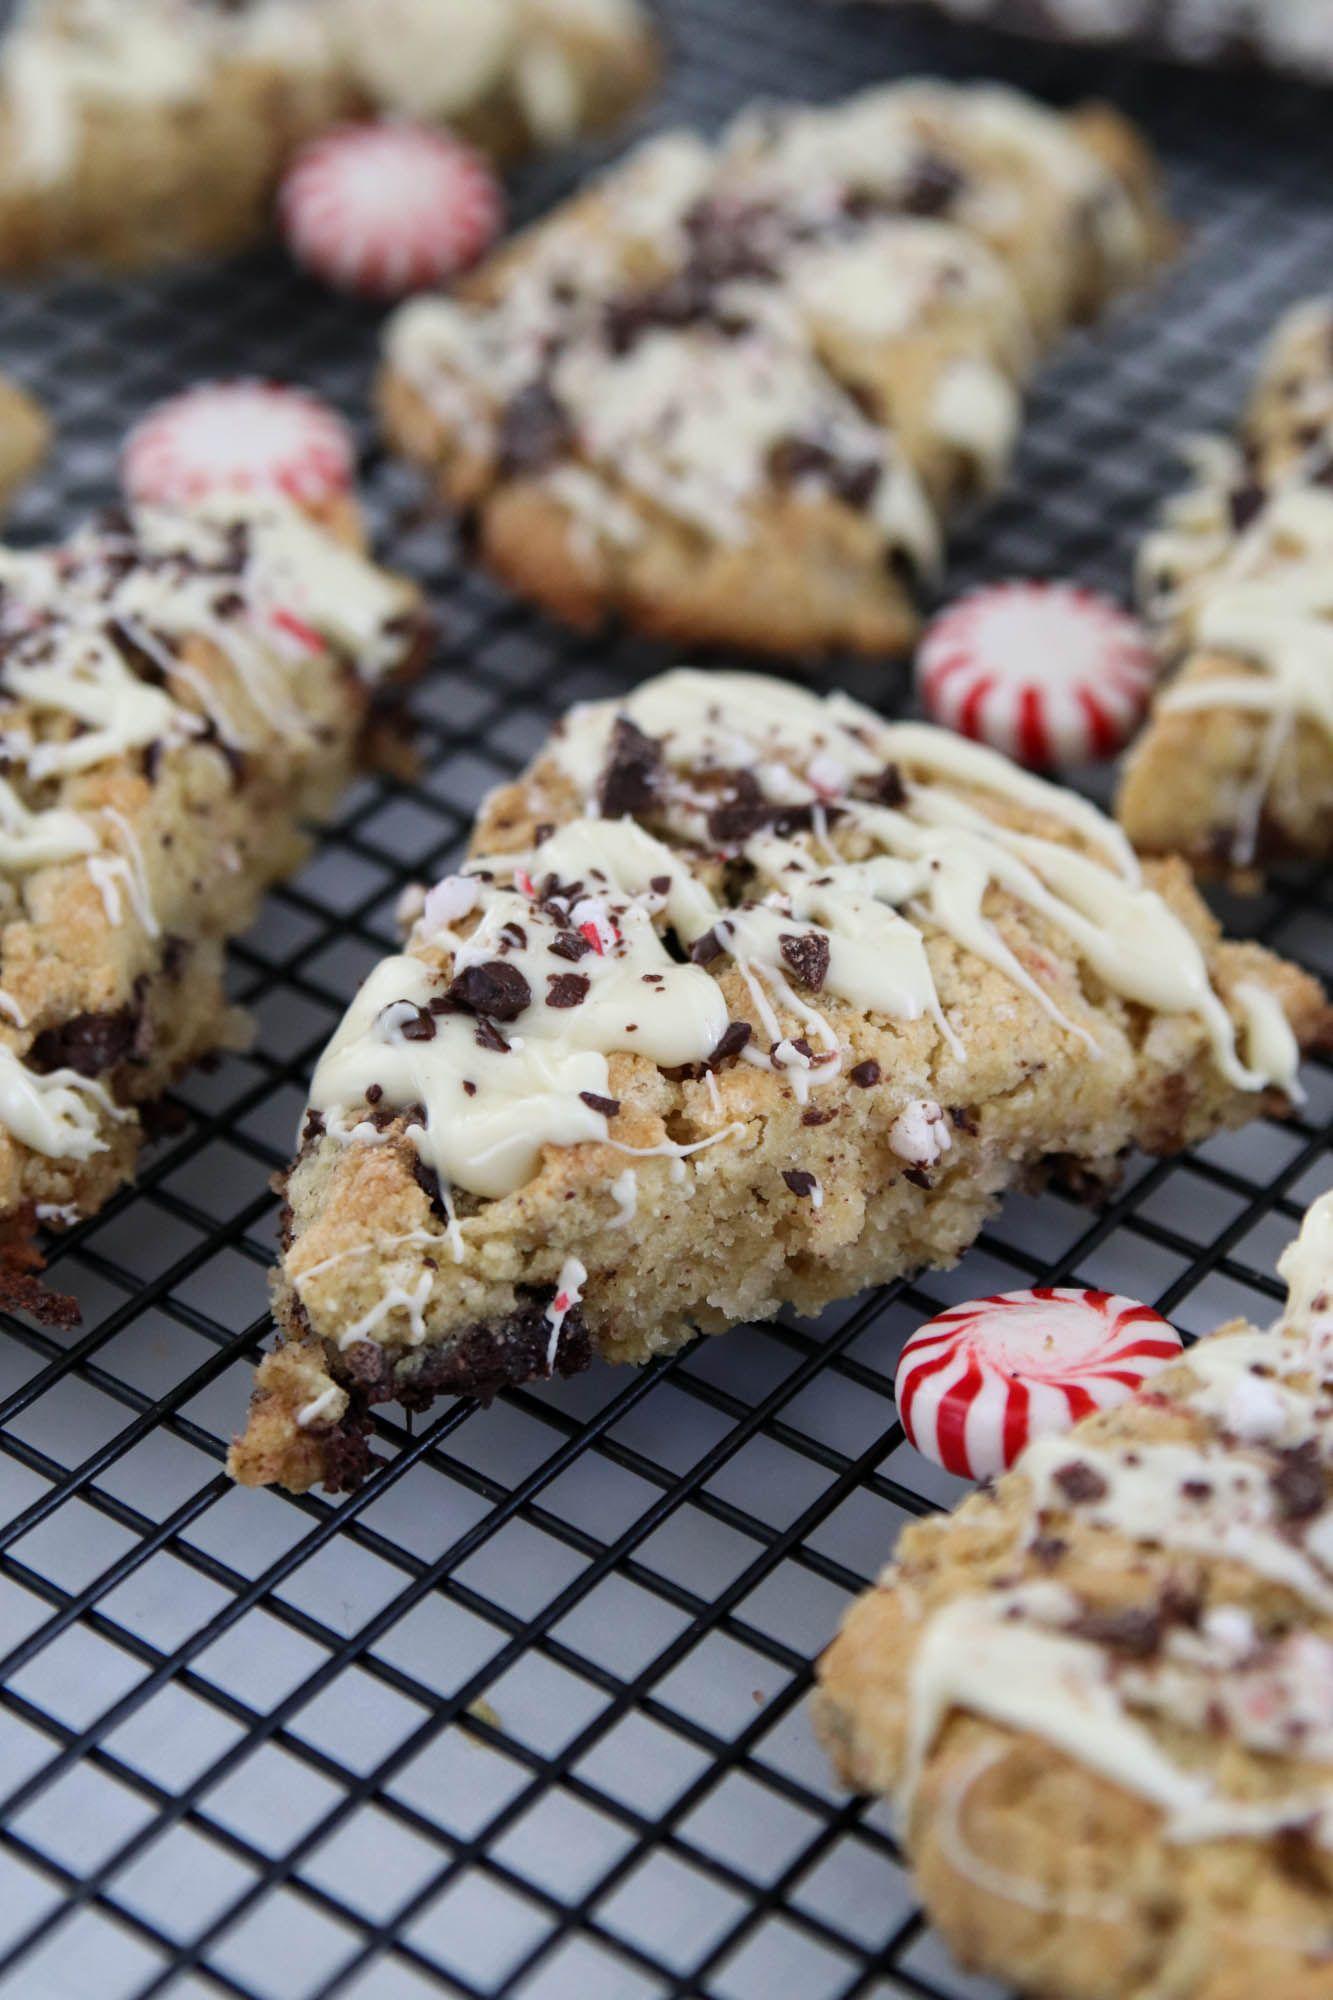 Gluten free peppermint bark scones the wood grain